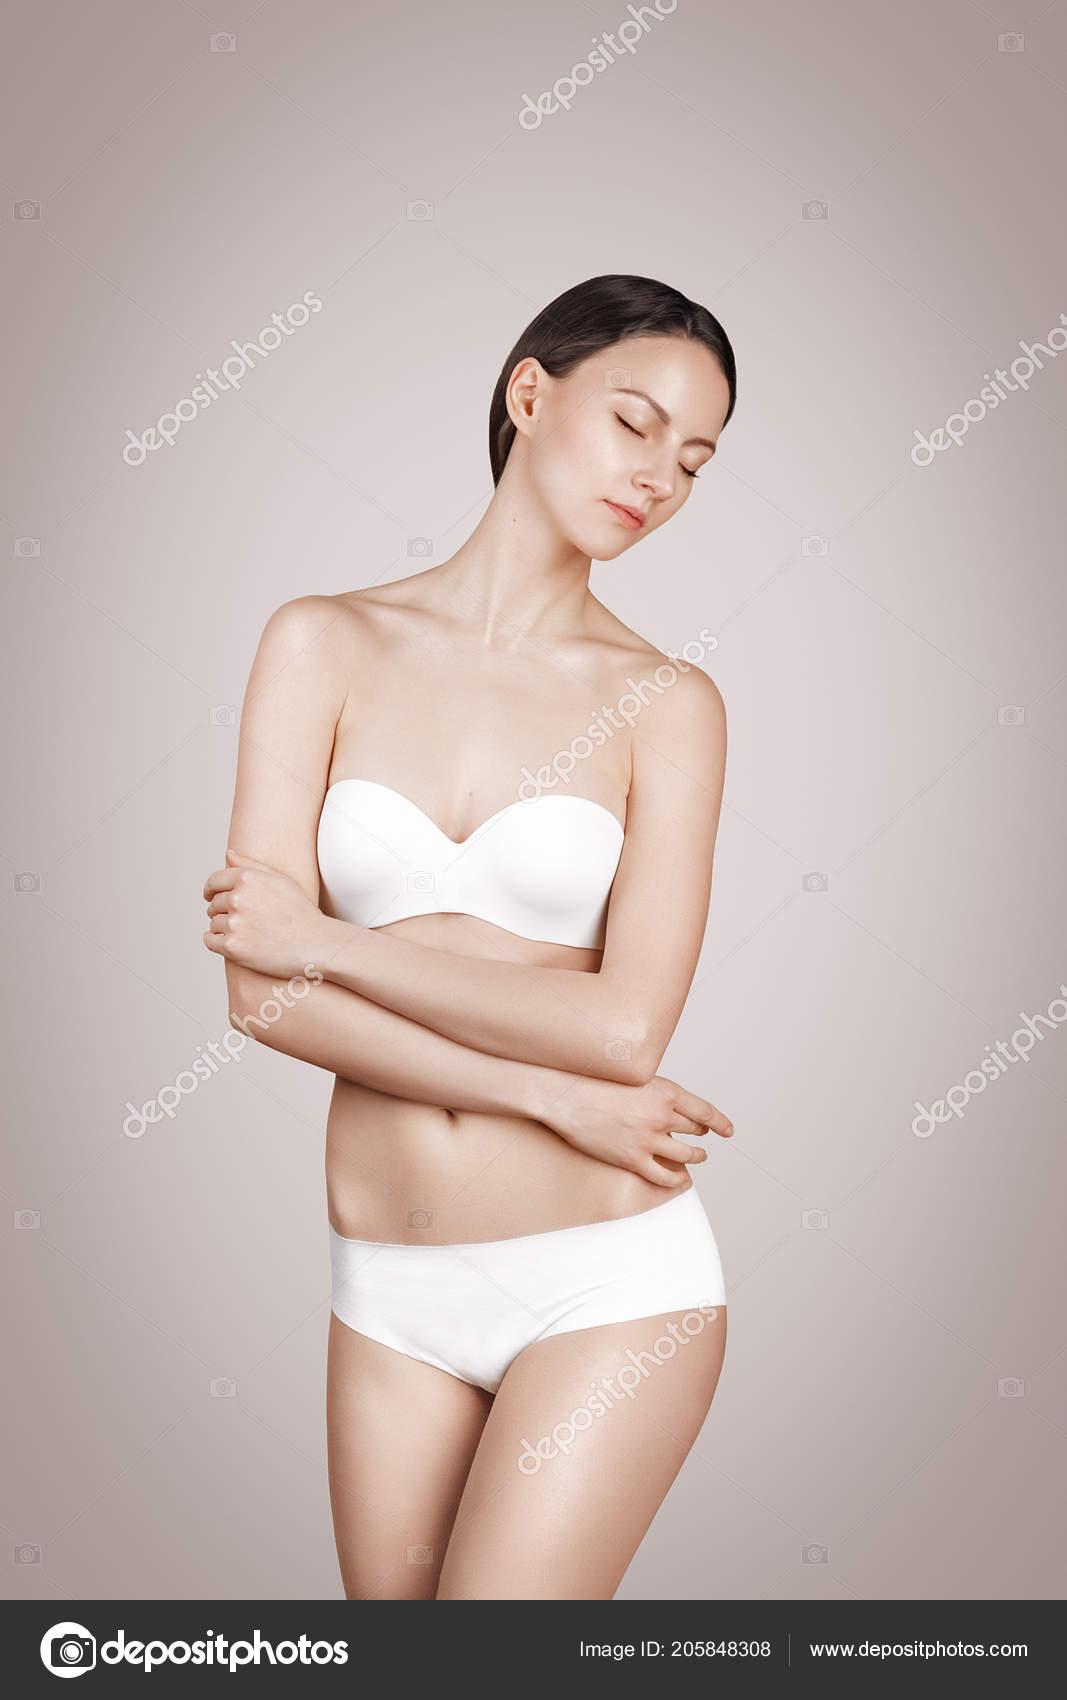 4613d5e5c Moda Mulher Roupa Roupa Interior Roupa Banho Biquíni Preto Teste —  Fotografia de Stock